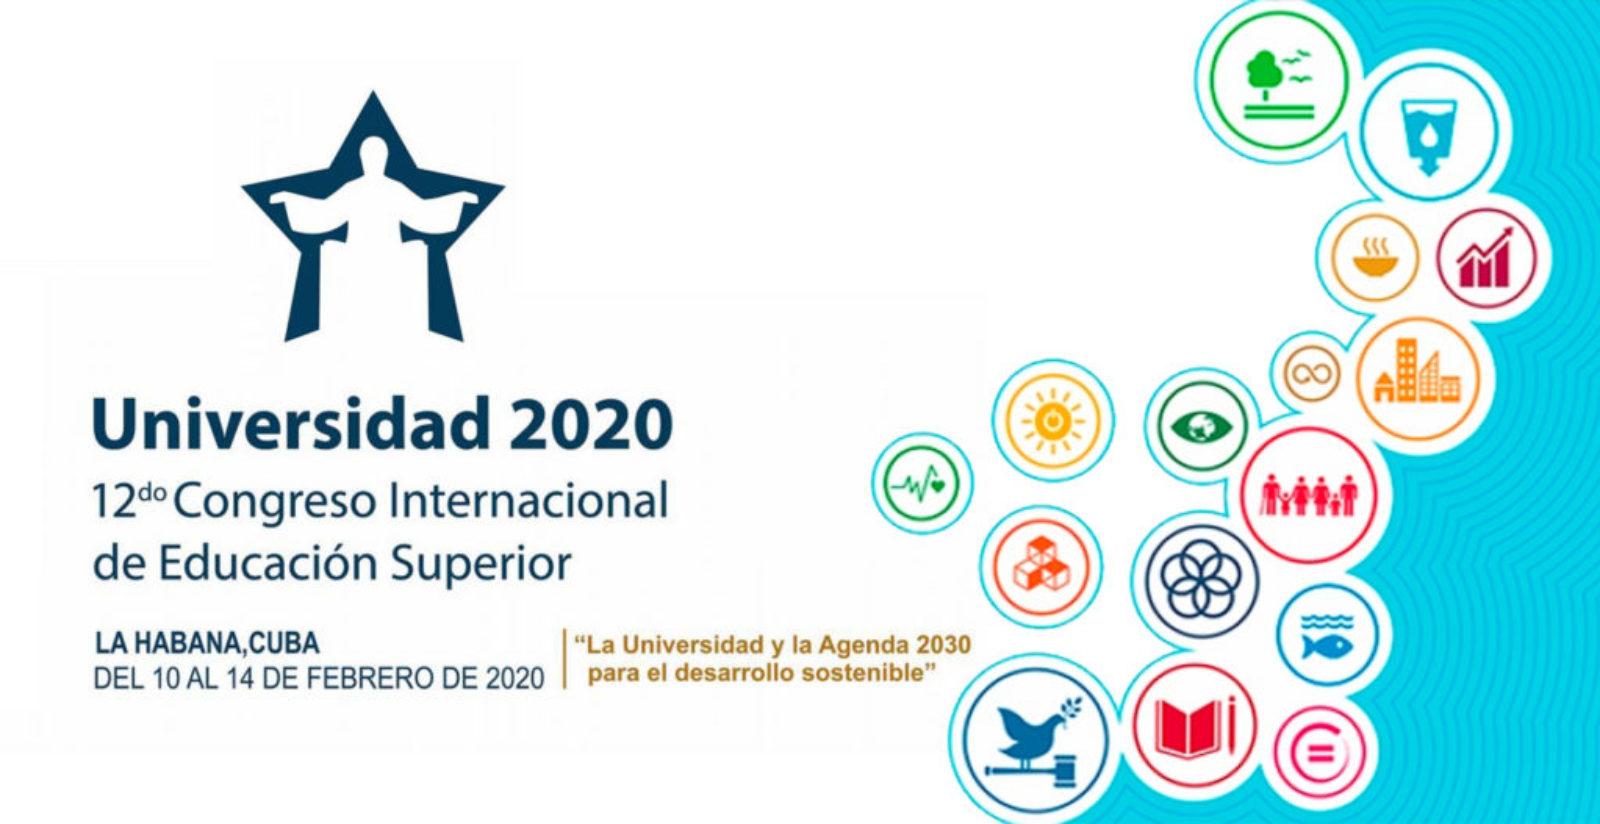 2-Universidad-2020